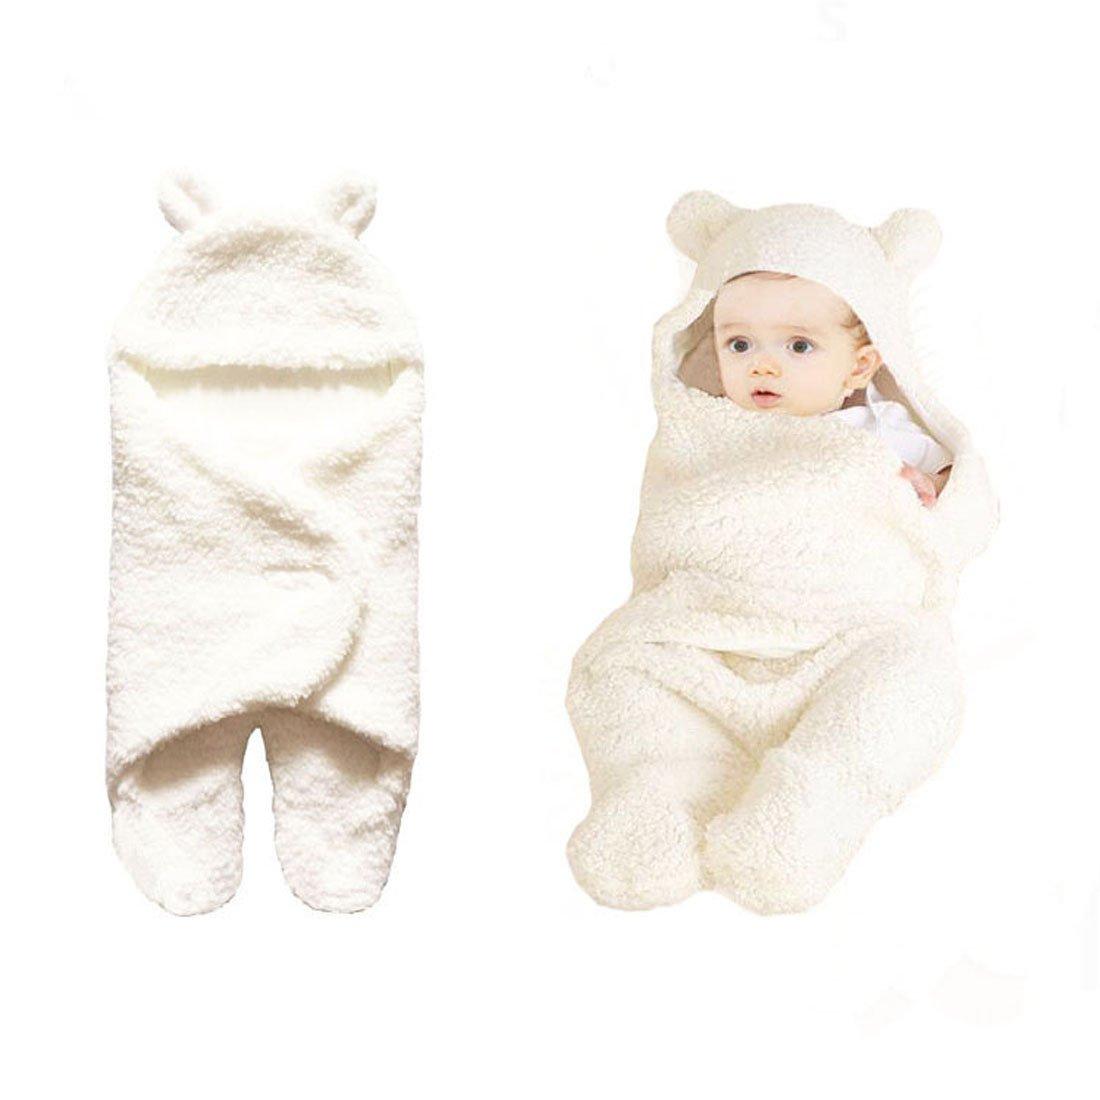 Wolmund Newborn 0-12 Months Baby Cute Cotton Receiving White Sleeping Blanket Boy Girl Wrap Swaddle